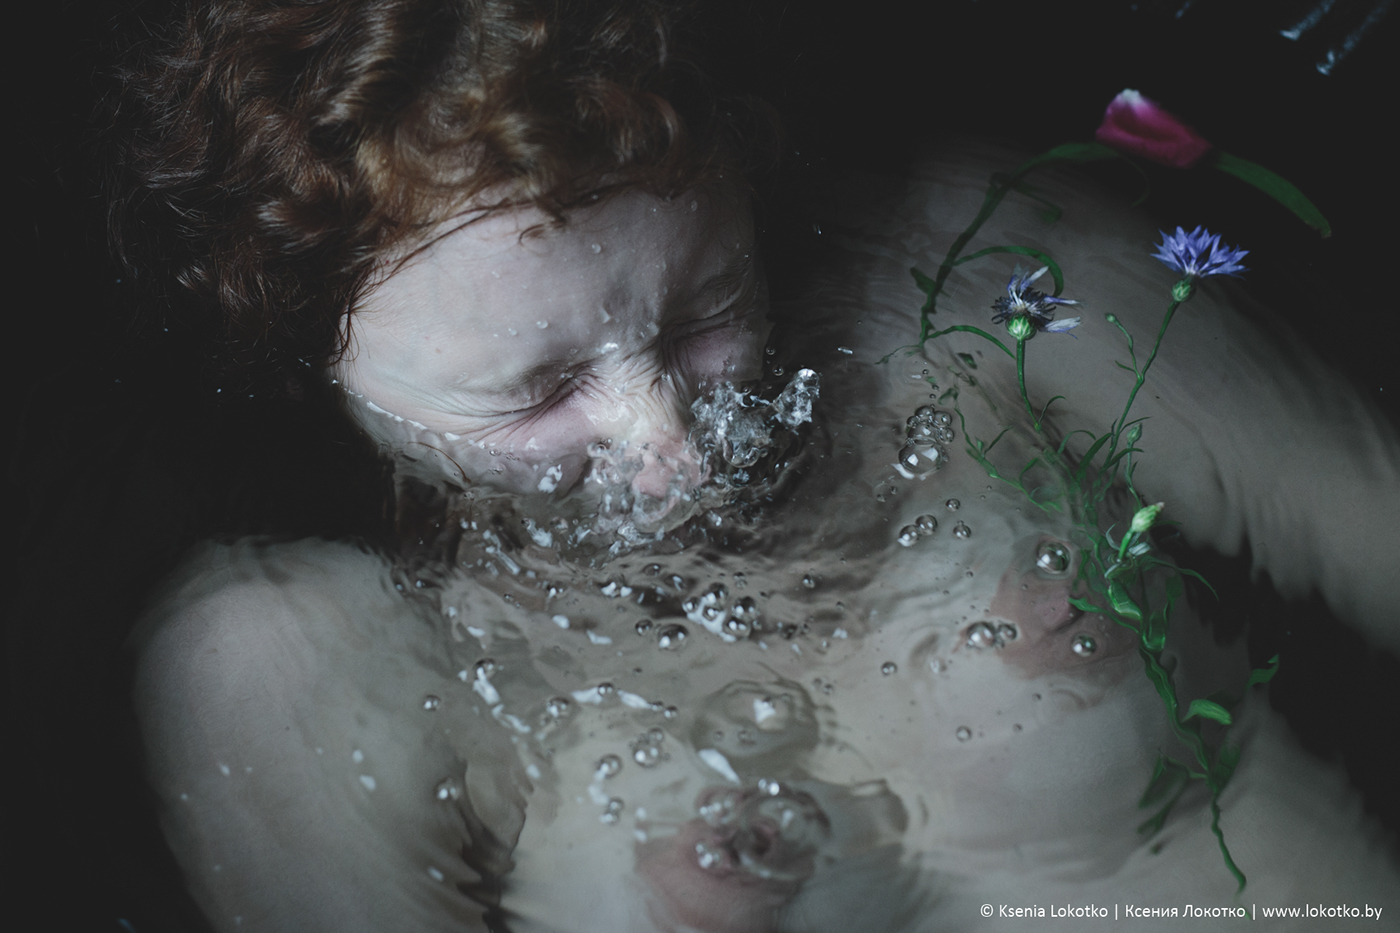 Alone with myself / фото Ксения Локотко